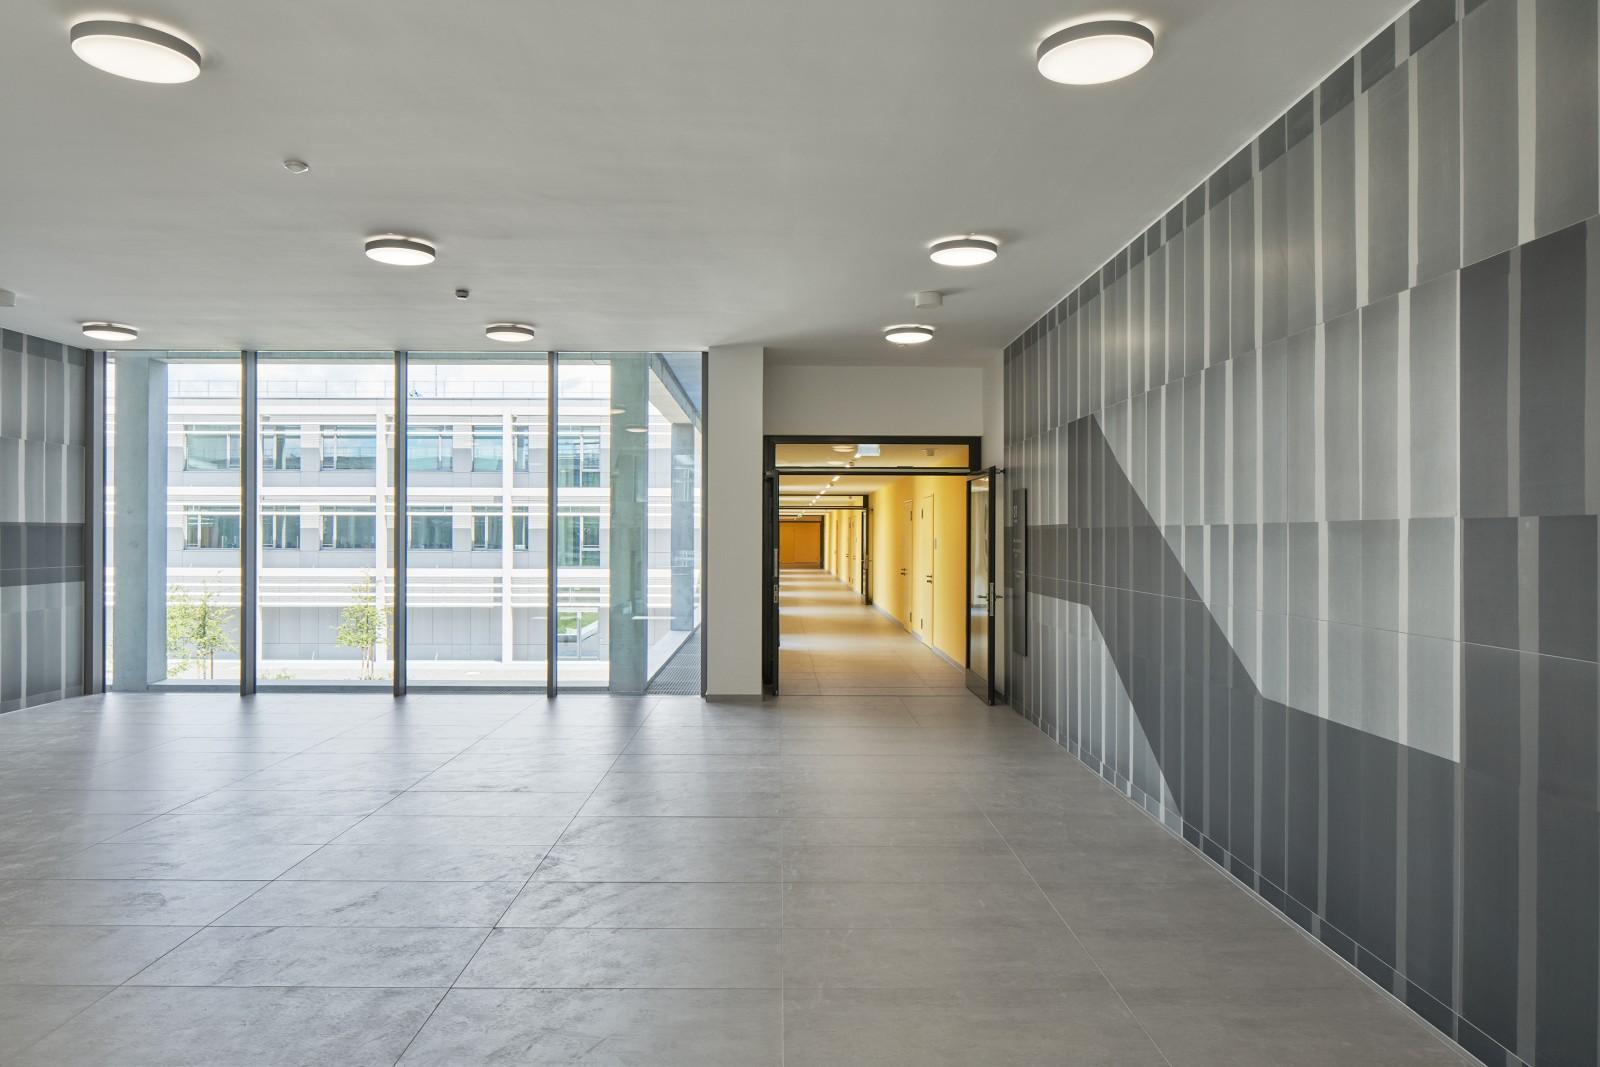 Lehrsaal- und Funktionsgebäude, GFK, Pöcking